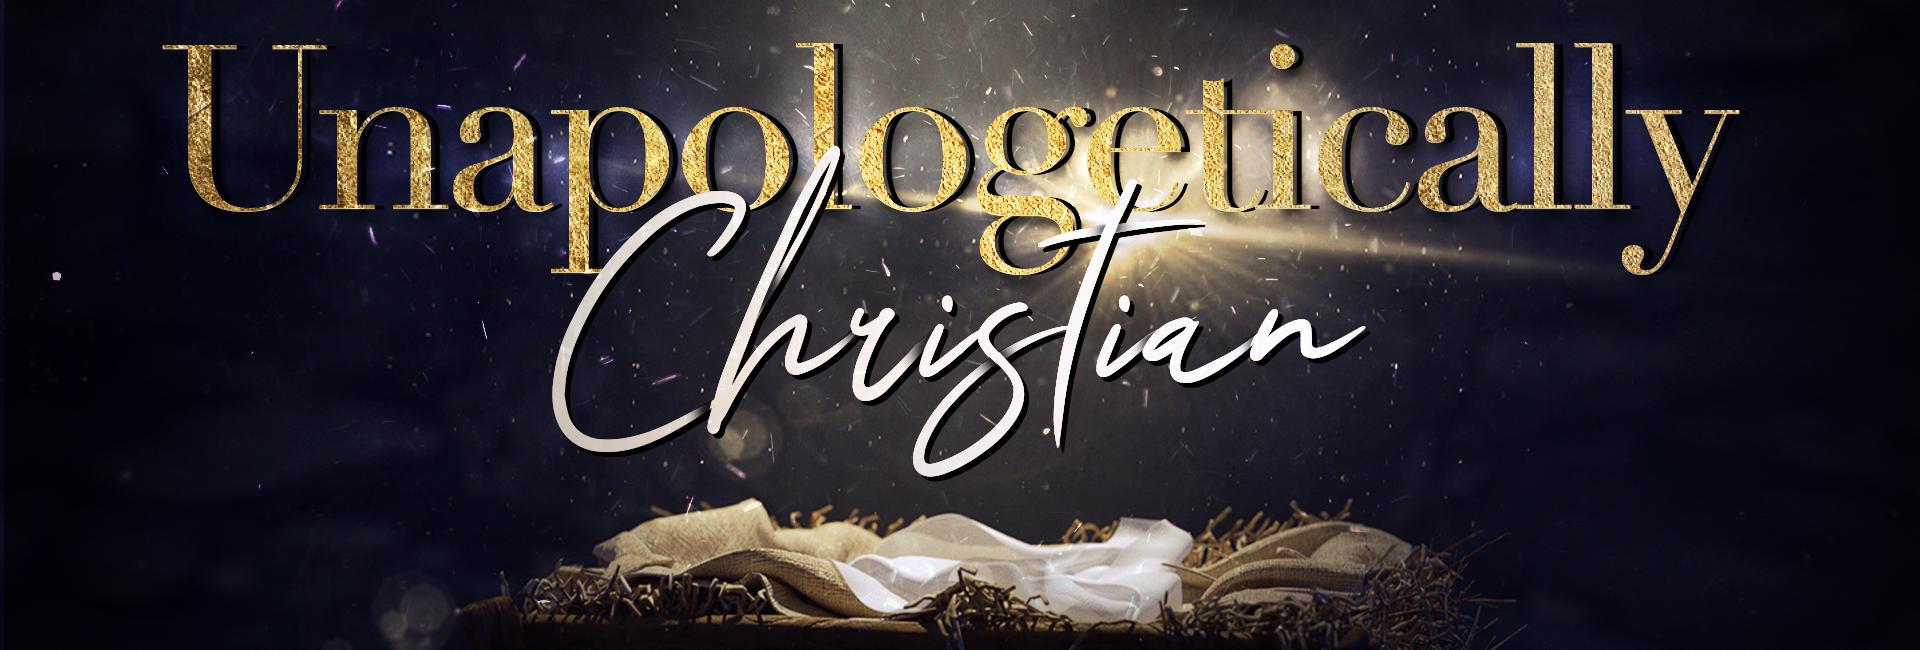 Unapologetically Christian Web copy